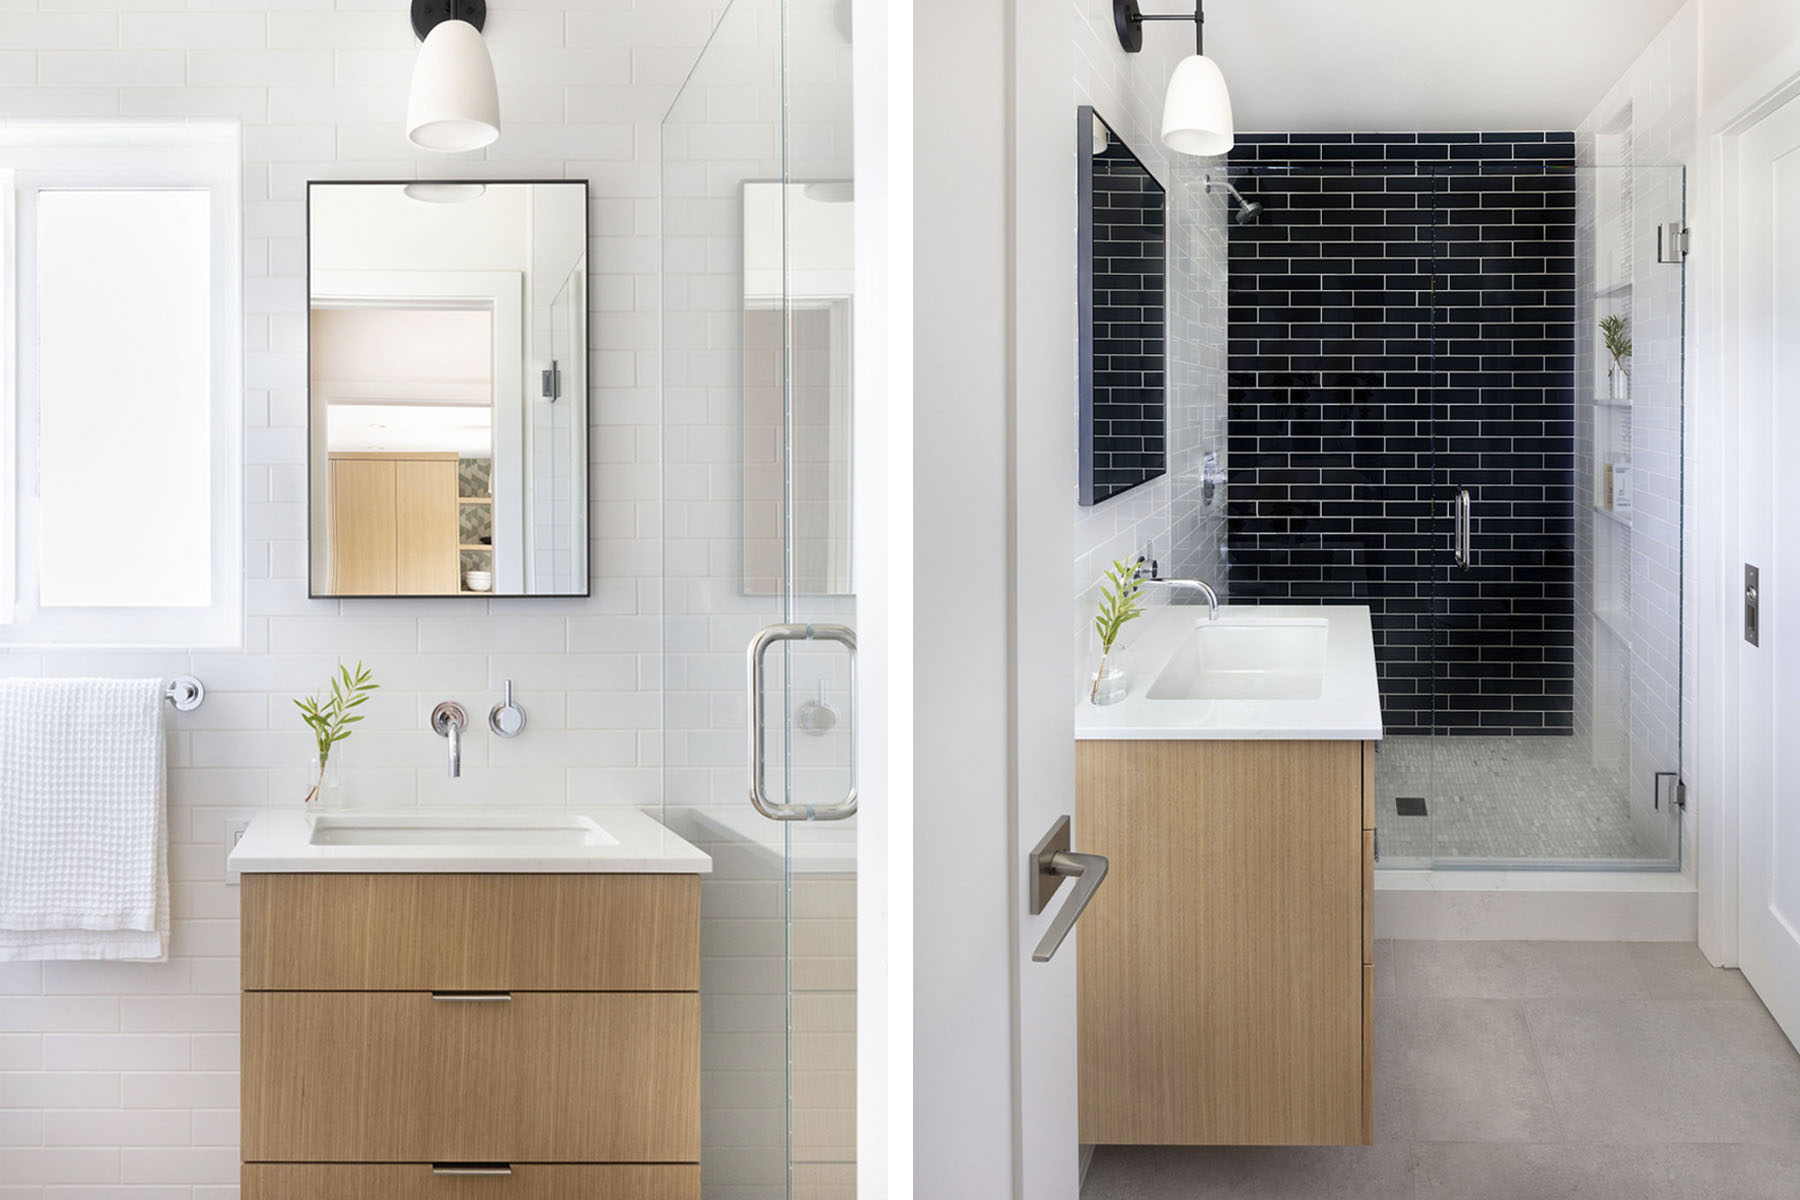 Morihara bathroom